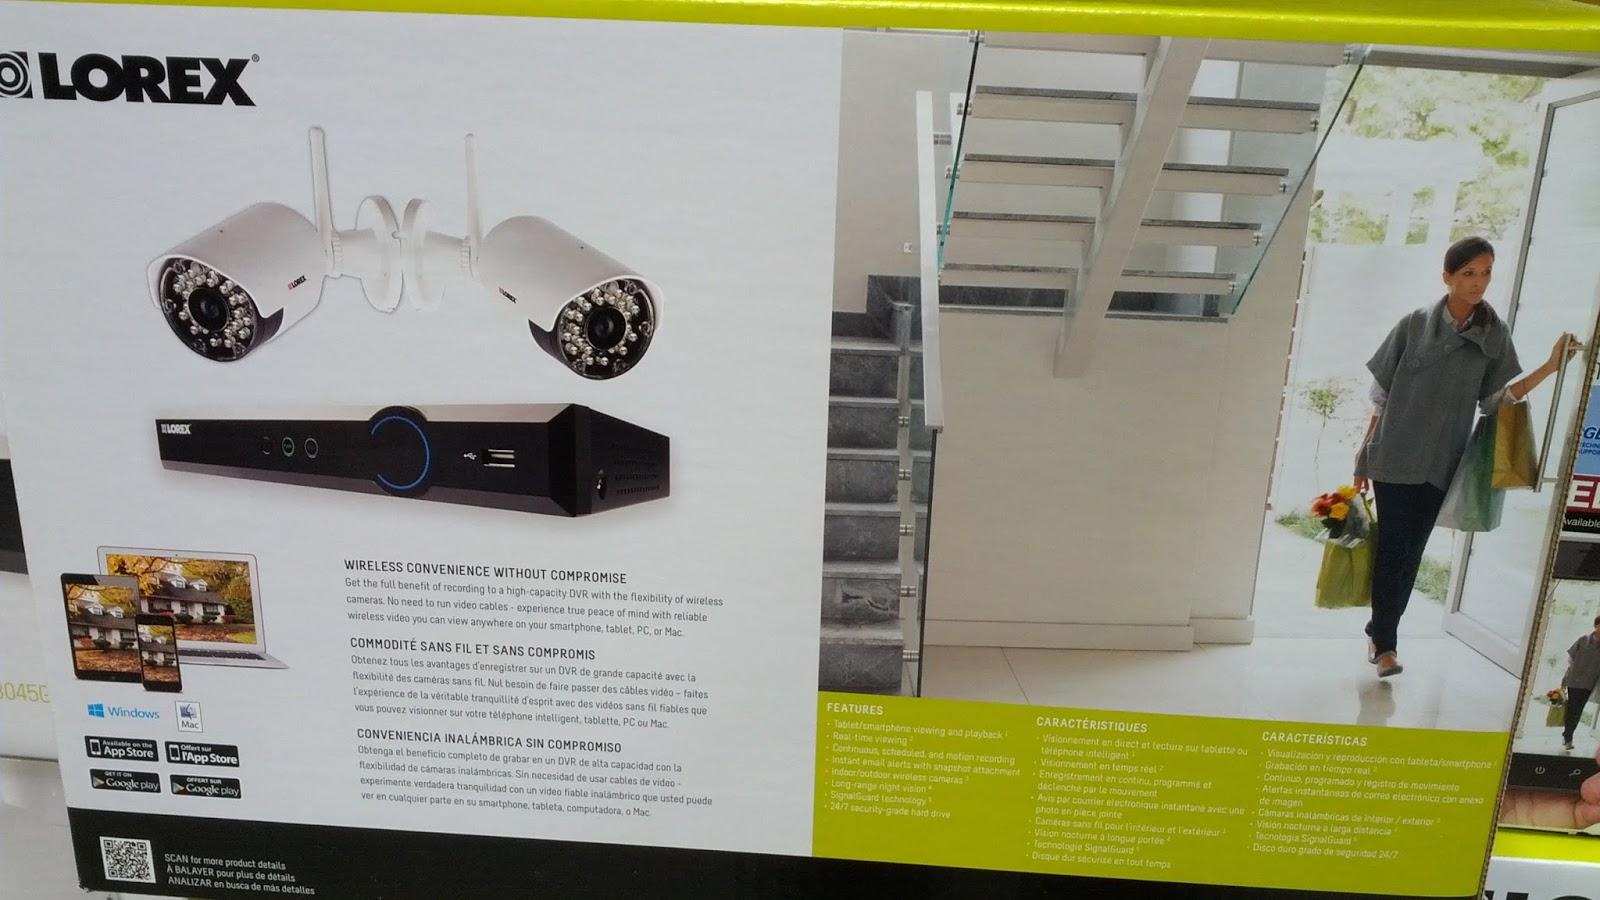 Lorex LH03045GC2WF Surveillance System and Wireless Camera Bundle  Costco Weekender